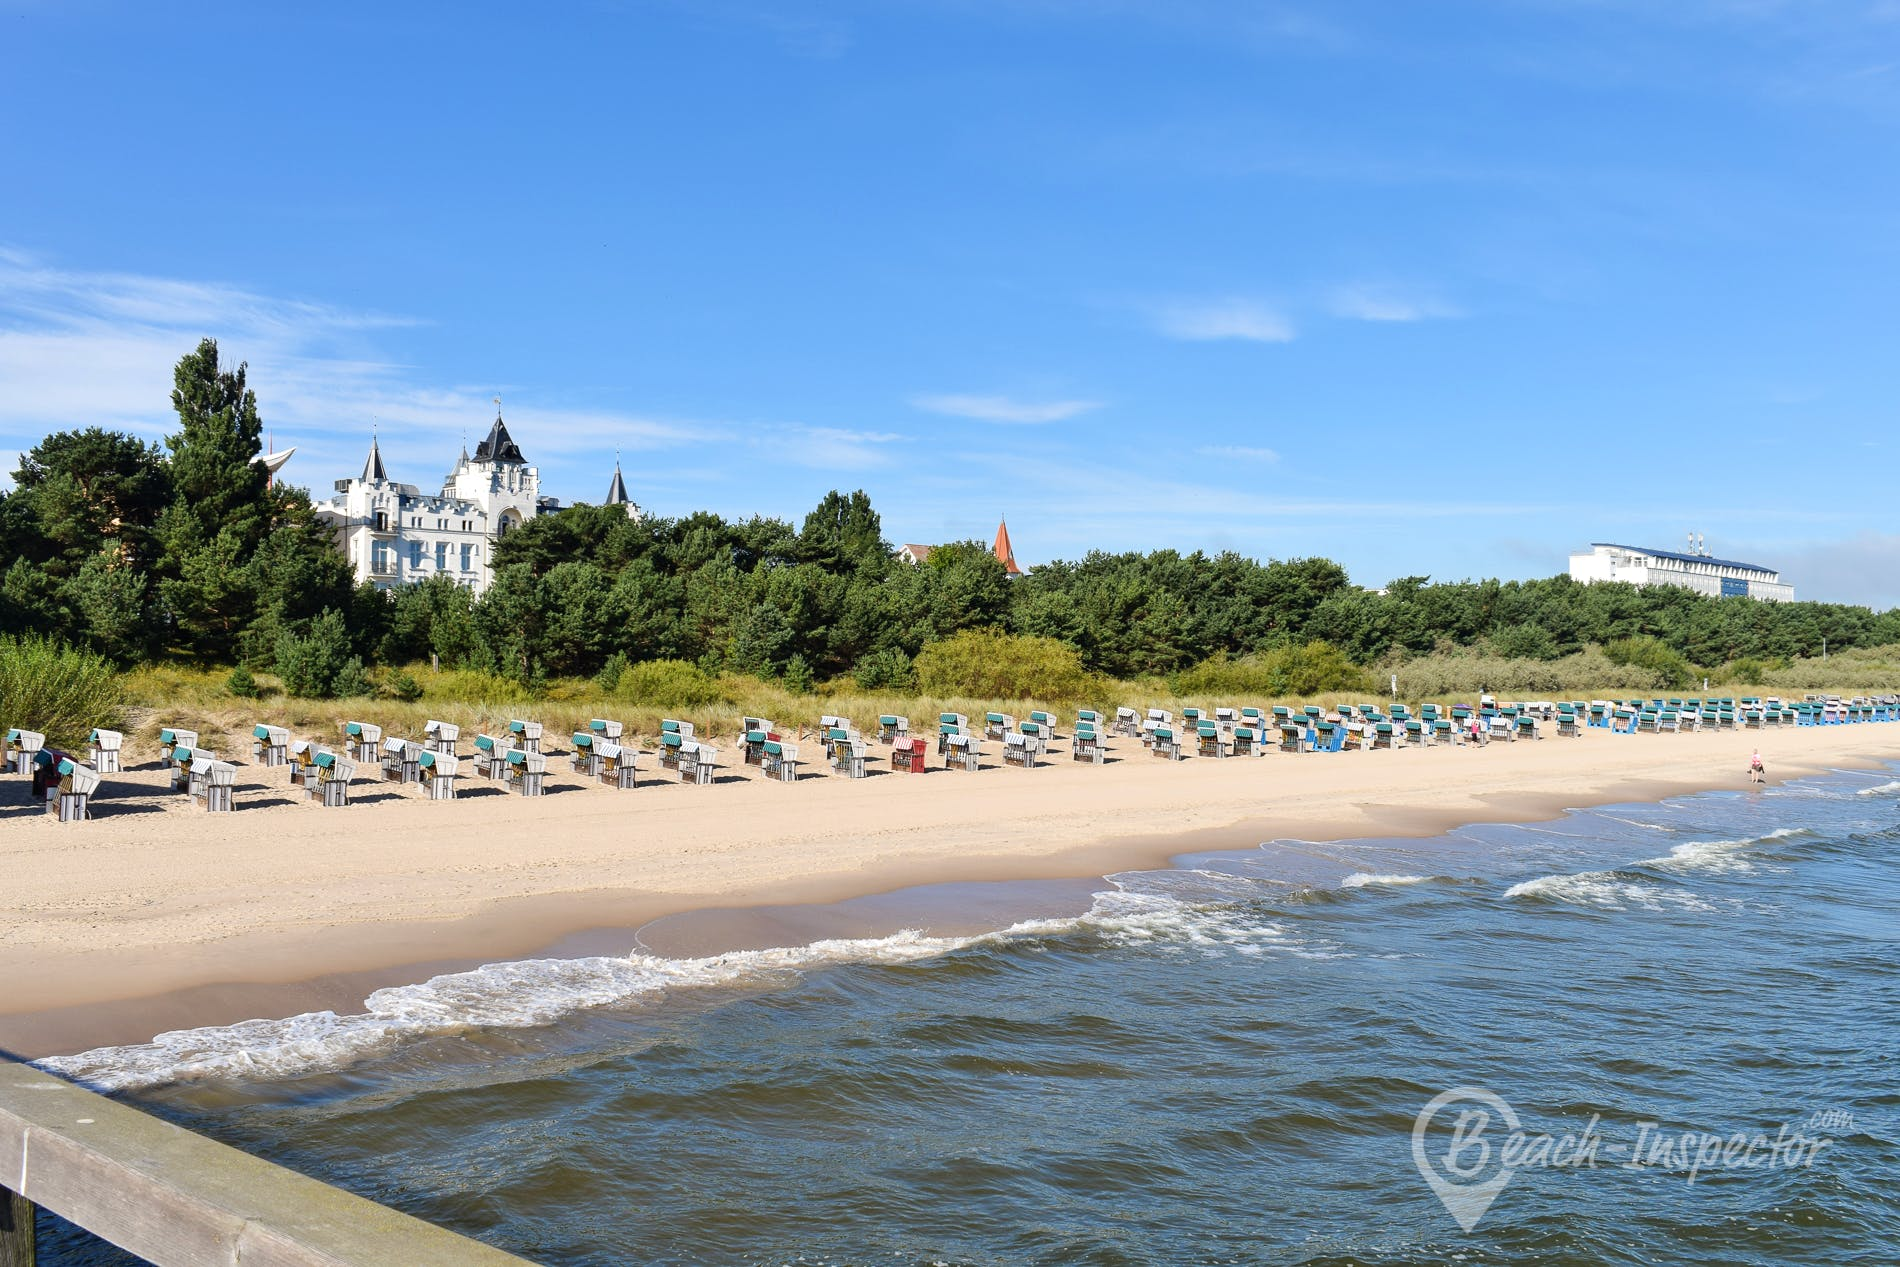 Beach Ostseebad Zinnowitz, Usedom, Germany